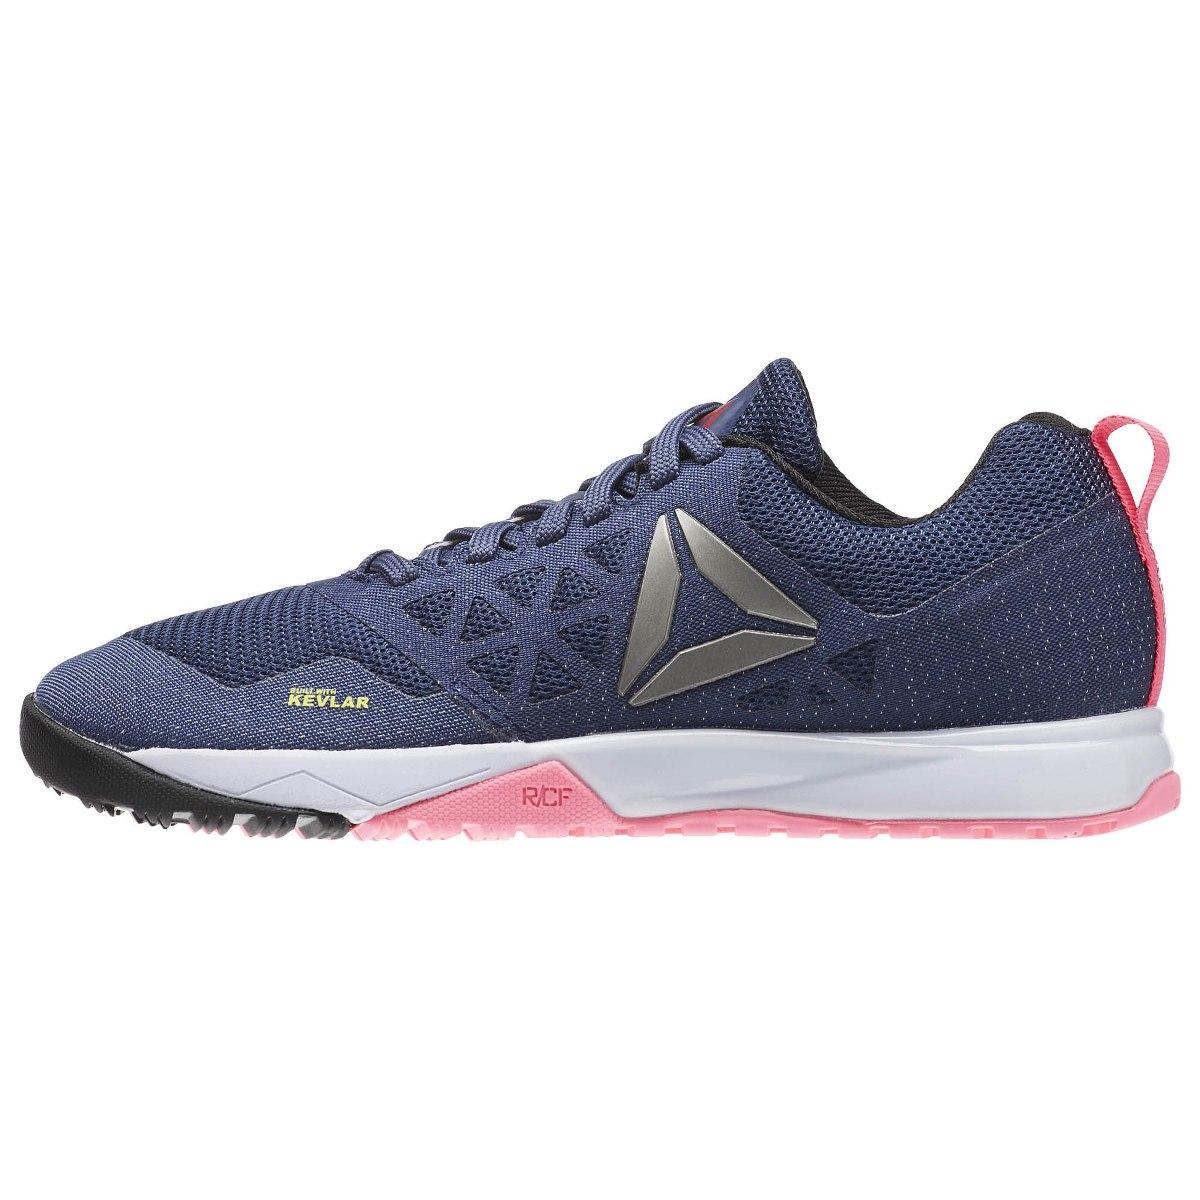 tenis reebok crossfit nano 6.0 azul feminino ar3301 kevlar. Carregando zoom. 233463a2ea7e9